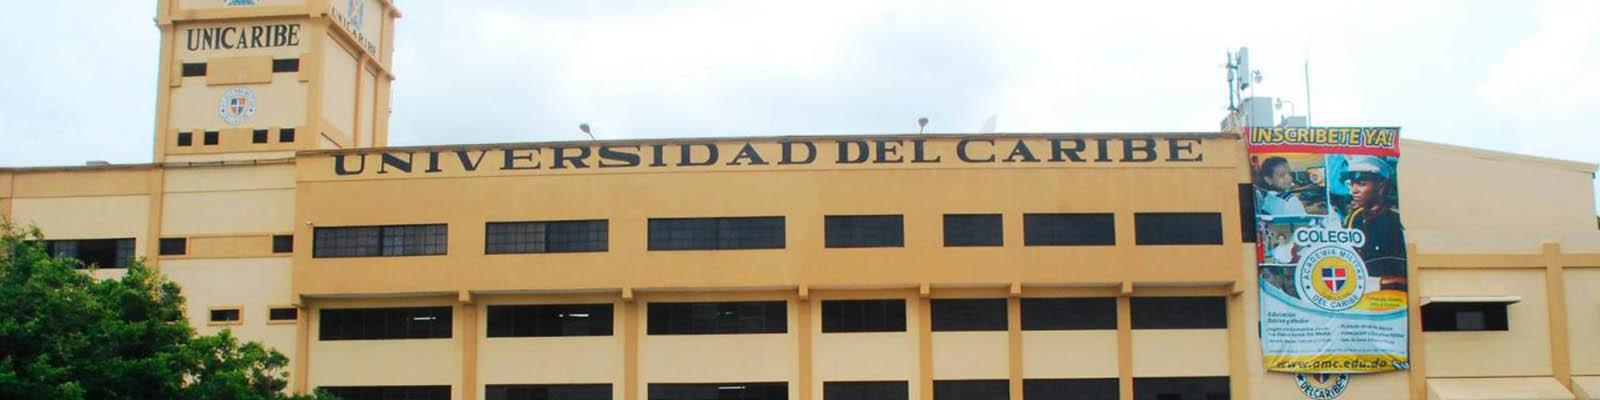 Universidad del Caribe ( UNICARIBE )